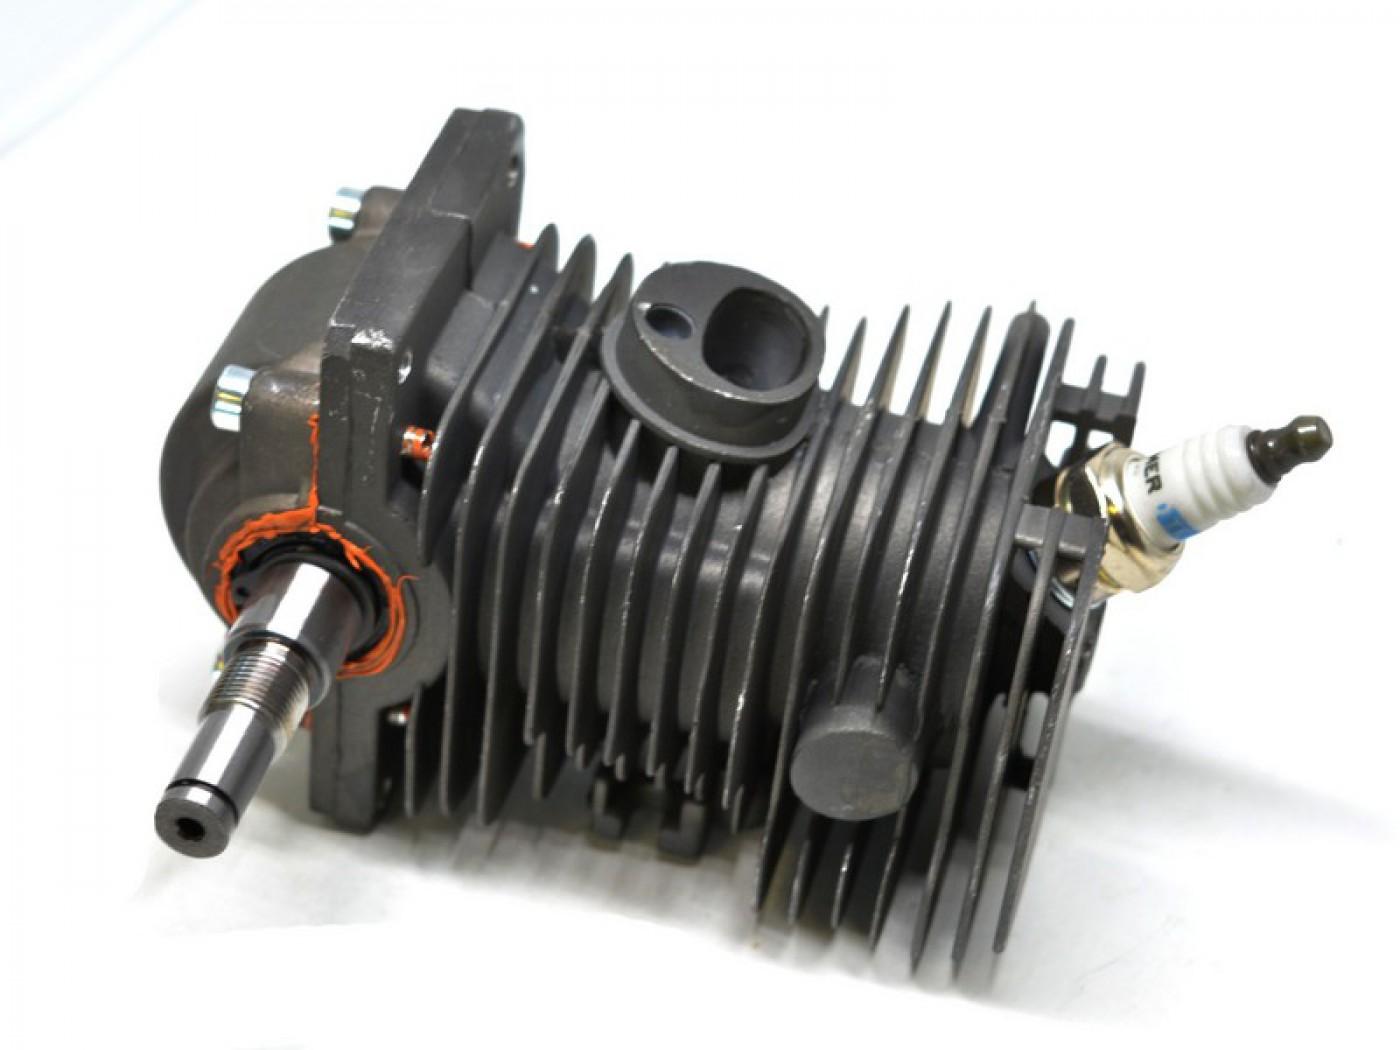 Motor Stihl MS 170 017 SUPER AKCE sleva 1200 Kč